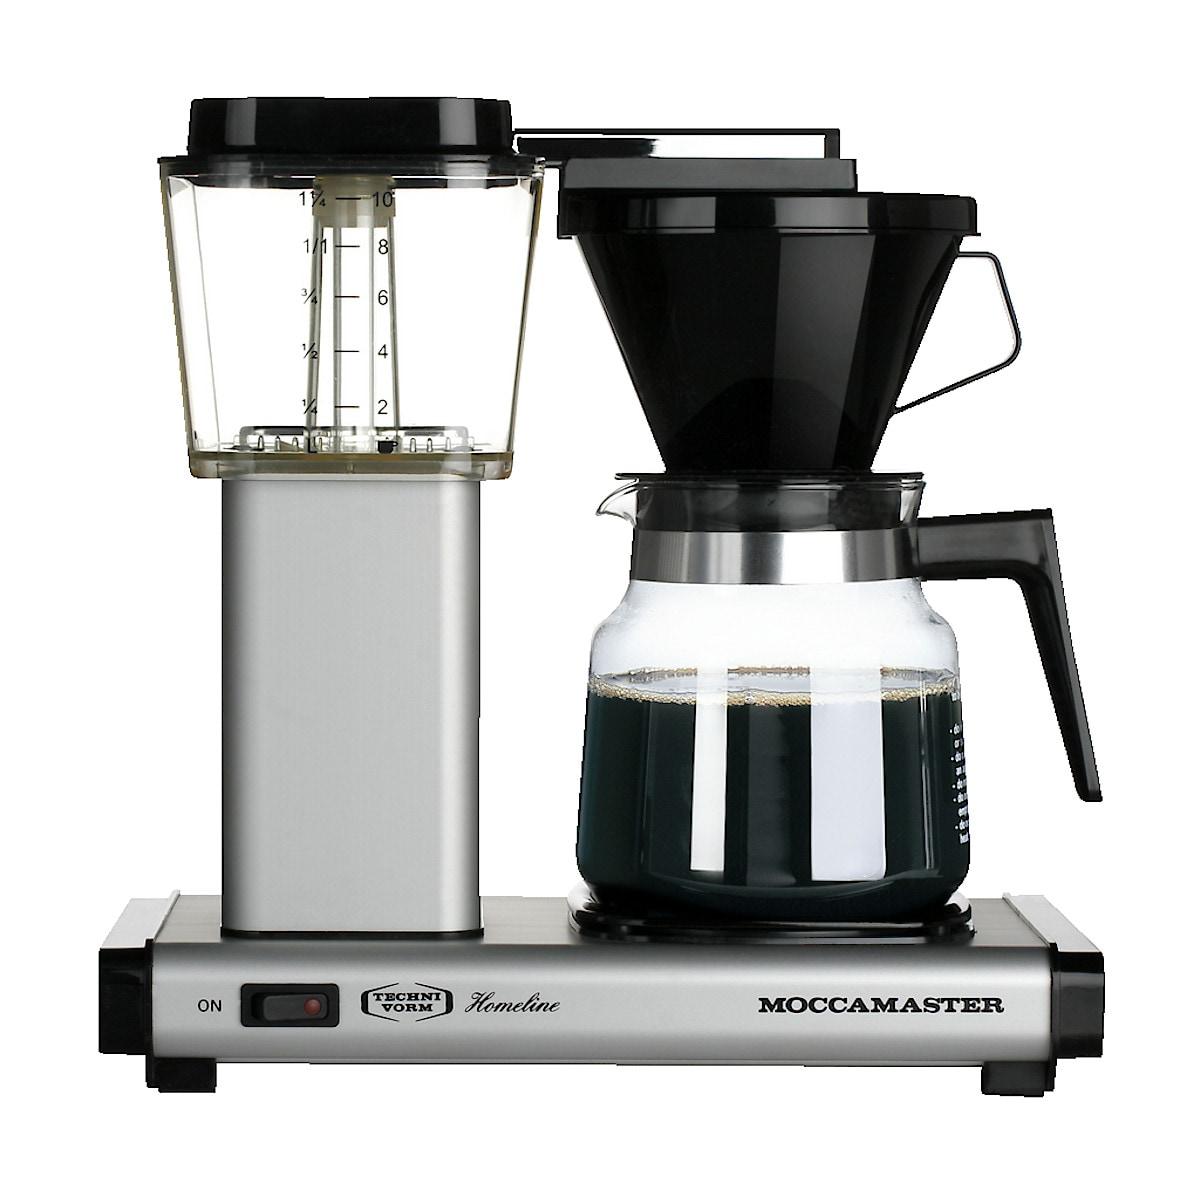 Kaffebryggare Moccamaster Homeline H741